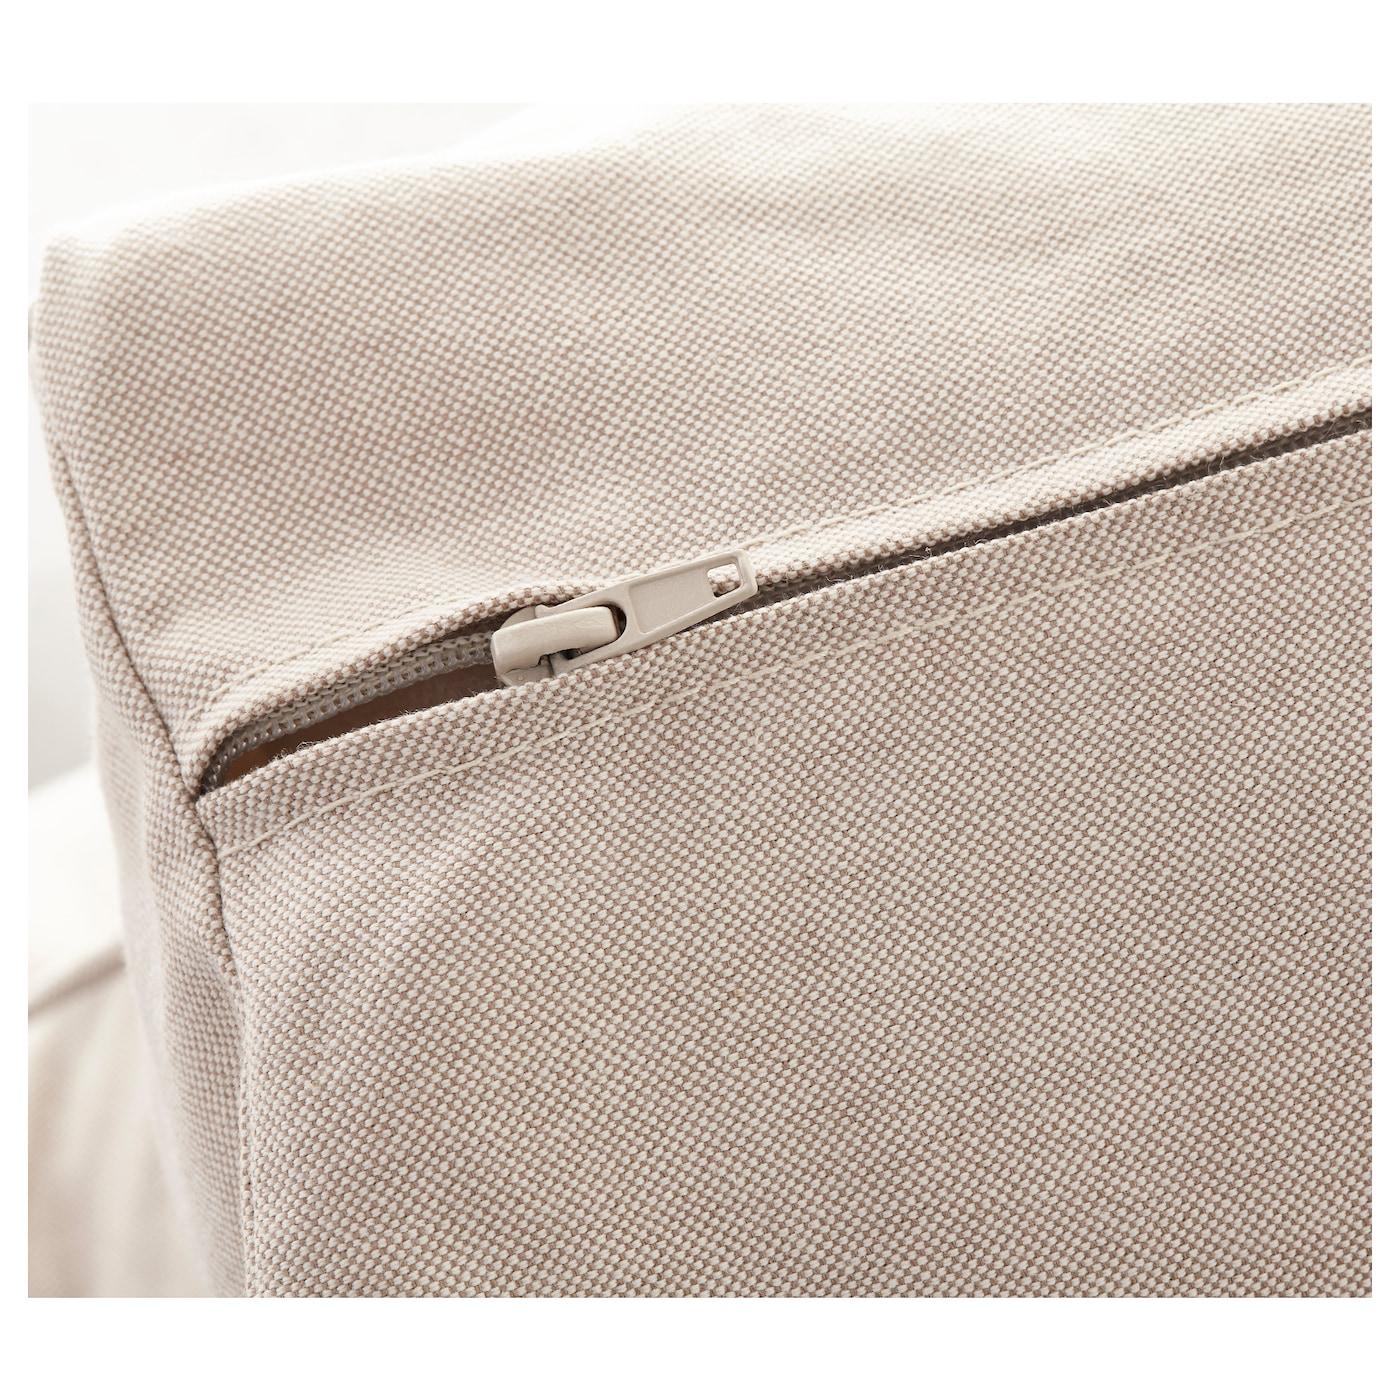 Sofa ikea ektorp  EKTORP Three-seat sofa Lofallet beige - IKEA